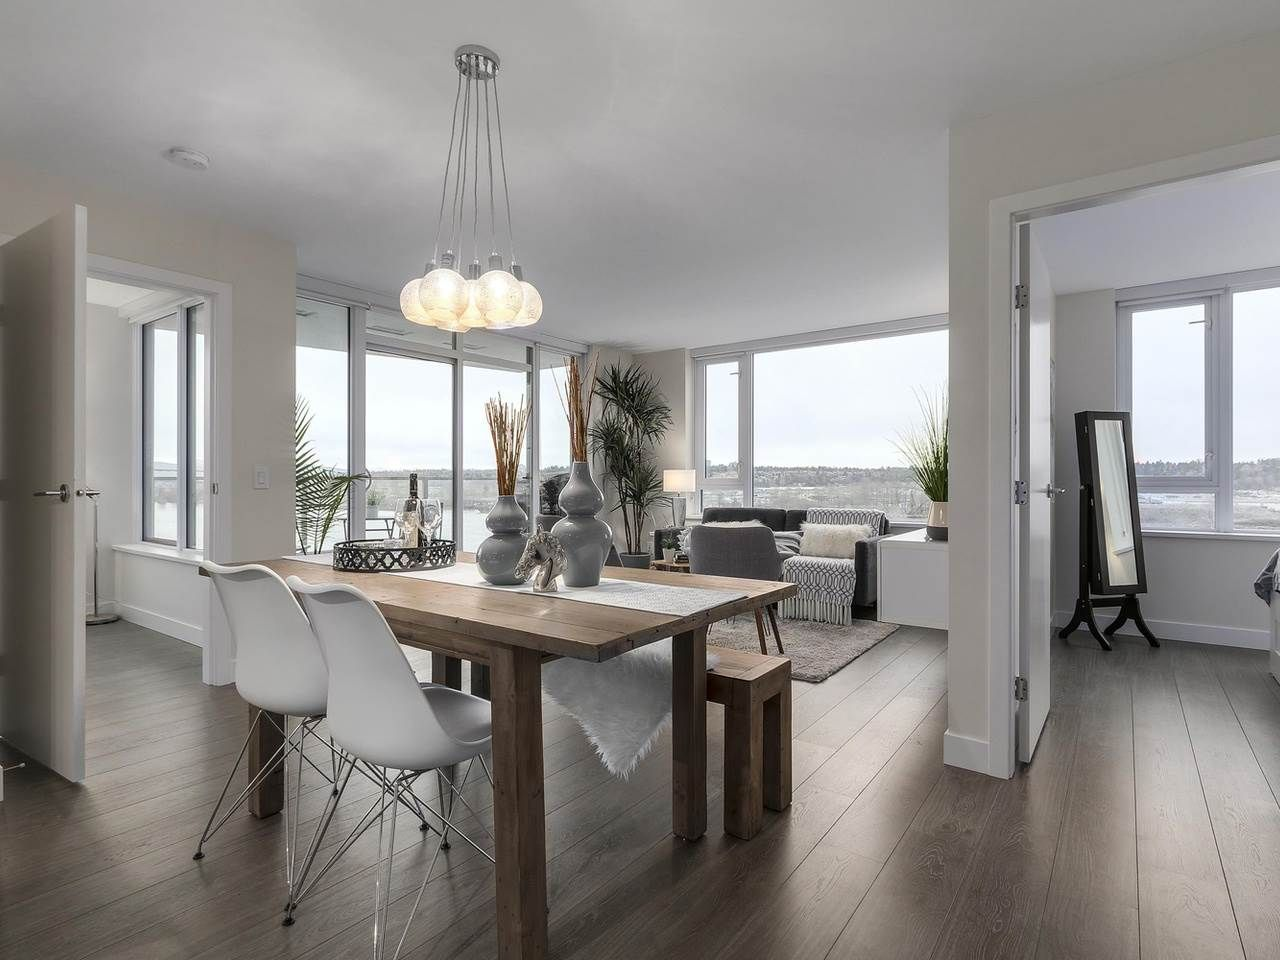 Main Photo: 1110 668 COLUMBIA STREET in : Quay Condo for sale : MLS®# R2124580